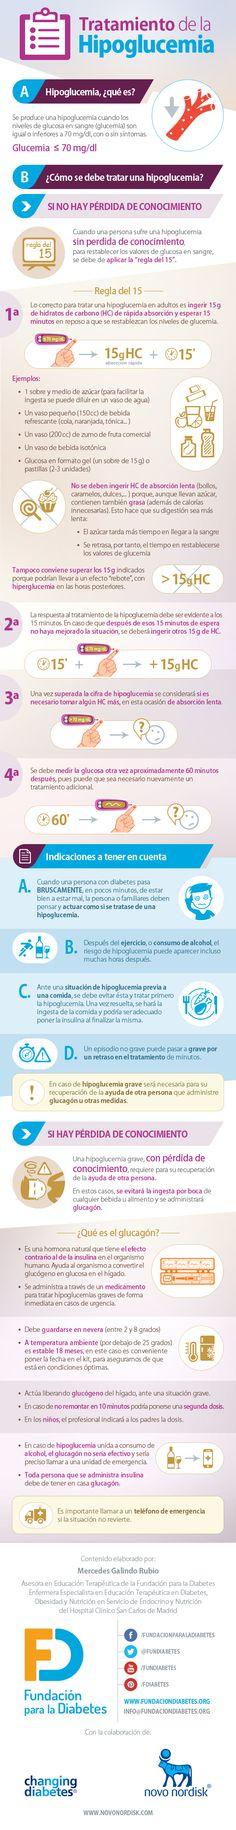 #Infografia Tratamiento de la hipoglucemia